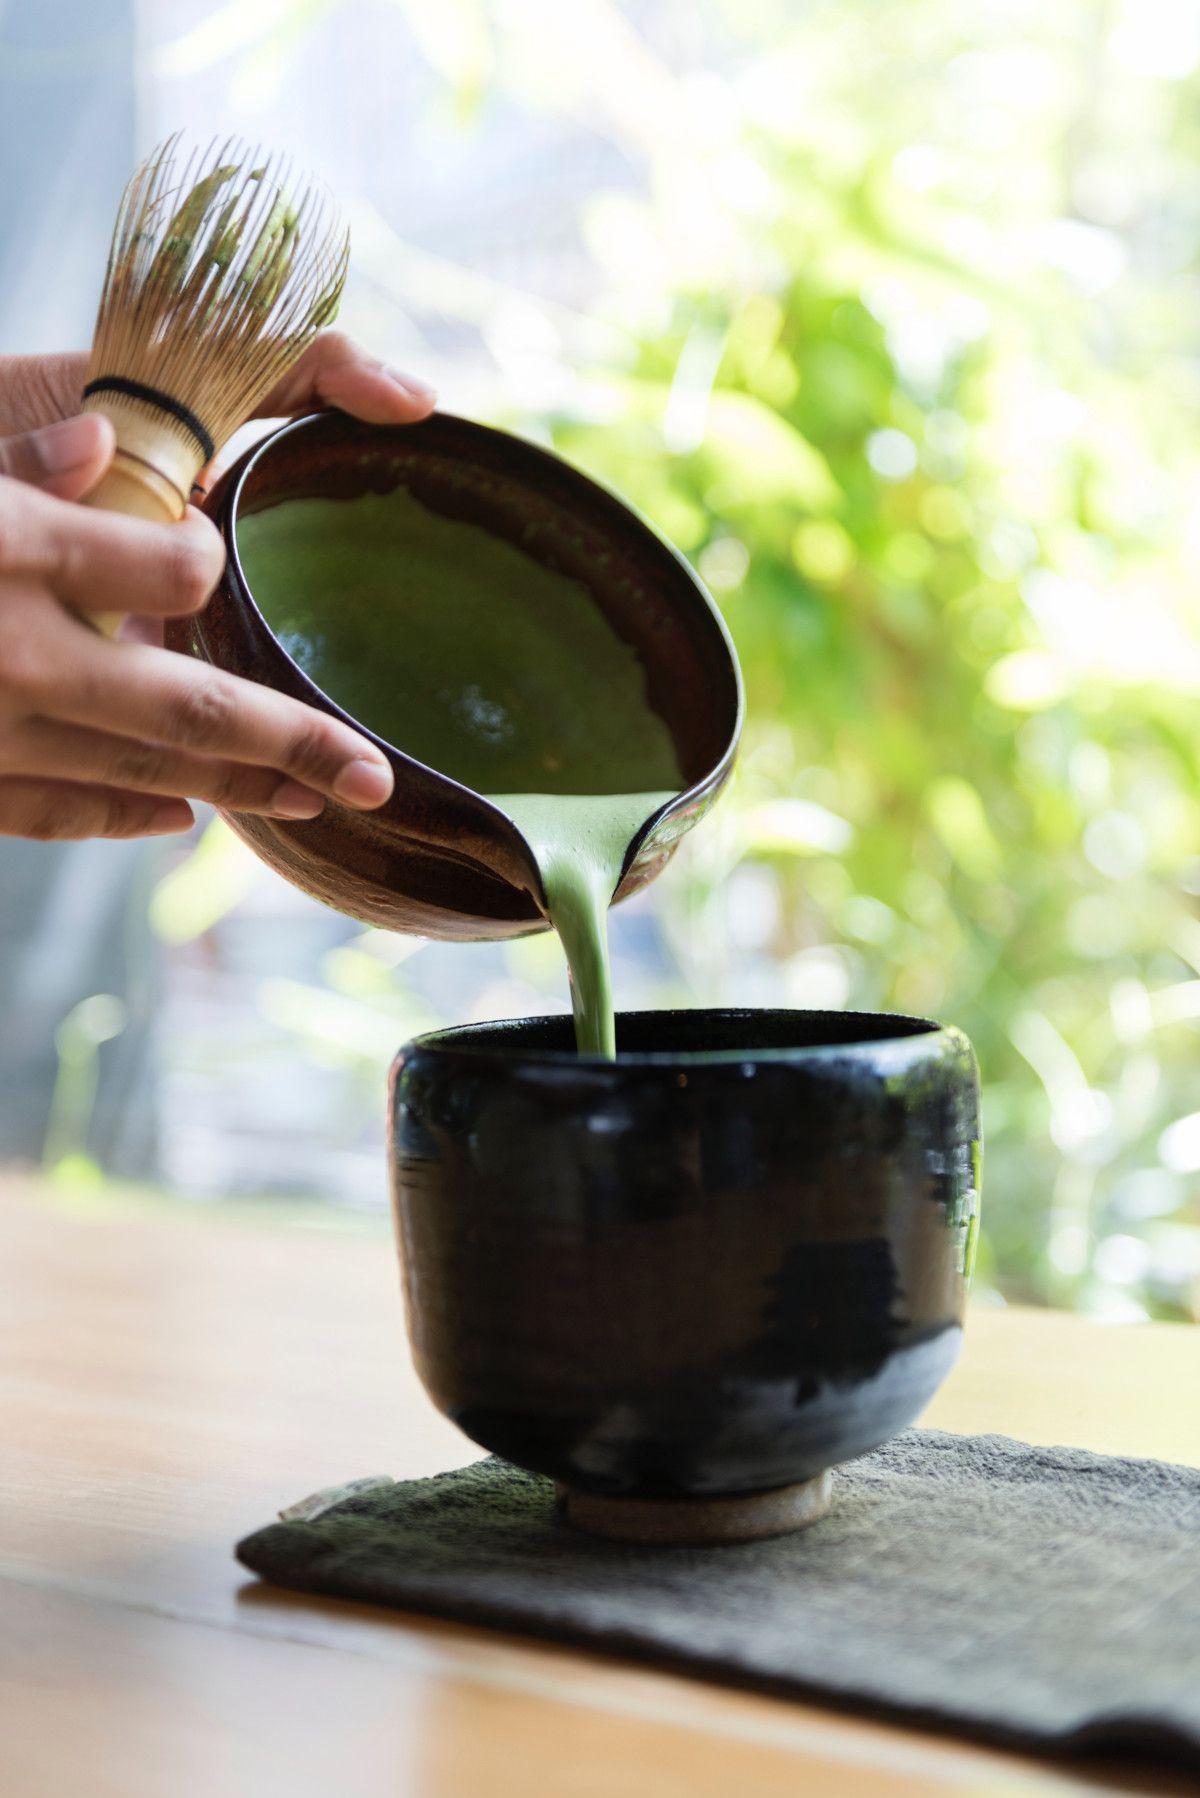 preparando té matcha